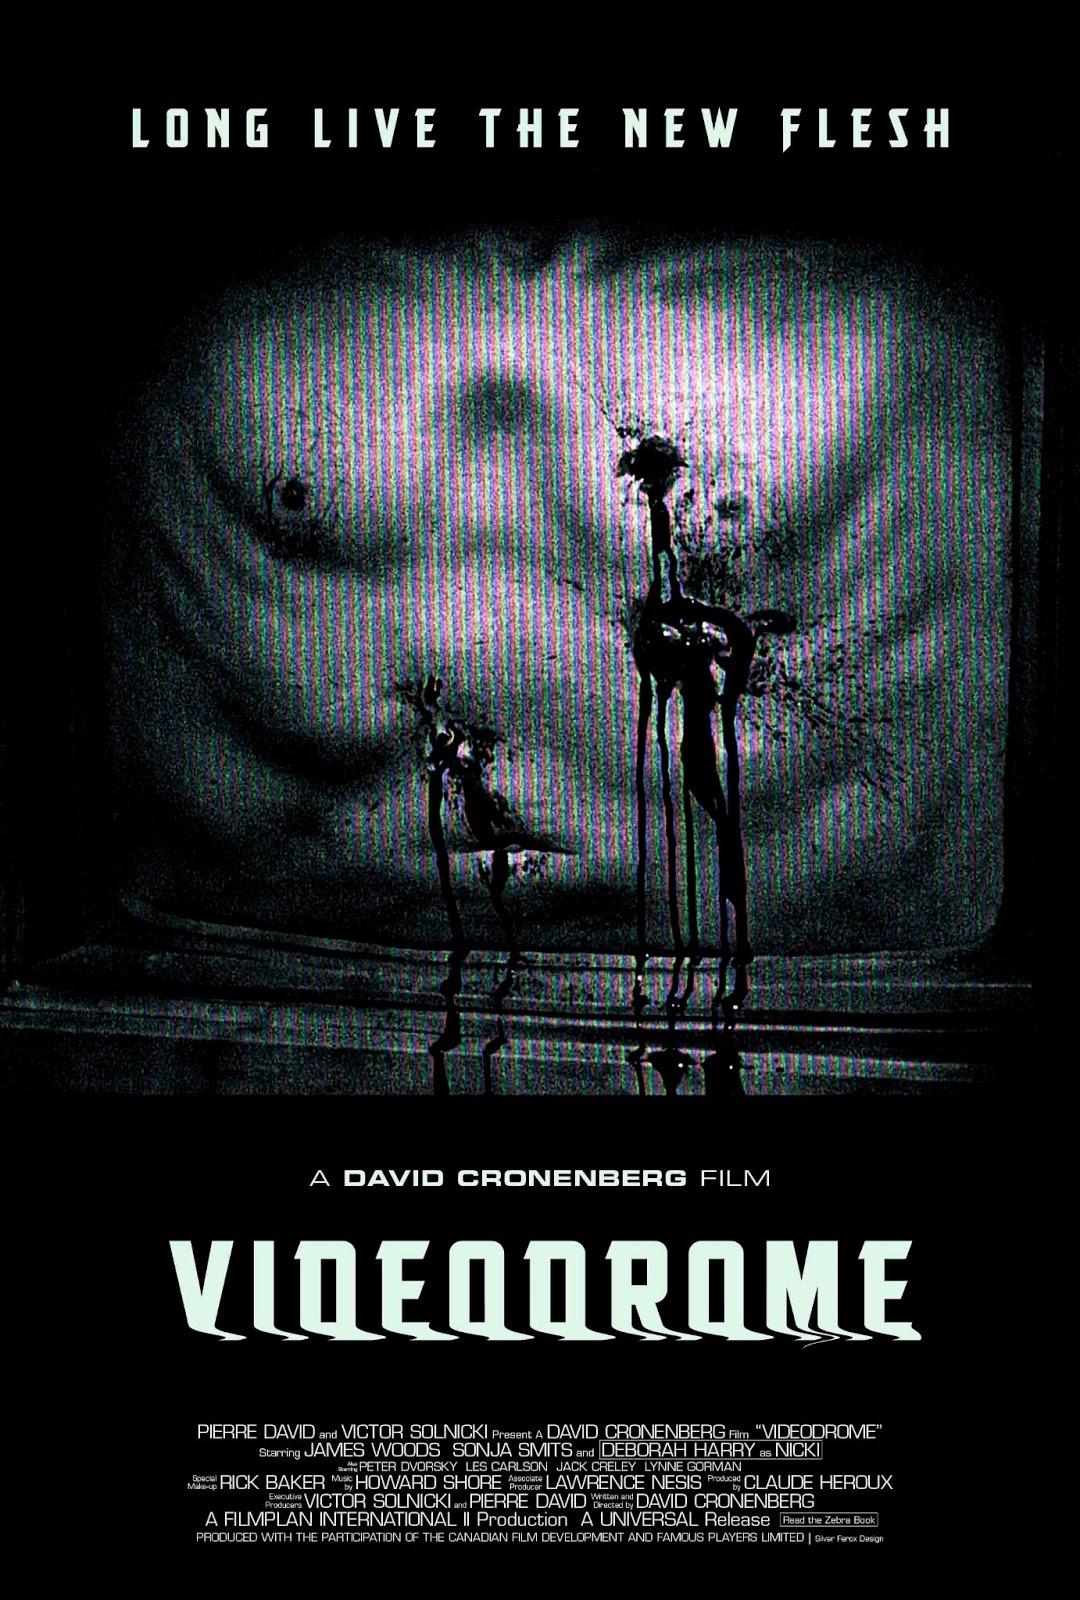 Silver Ferox Design Videodrome David Cronenberg 1983